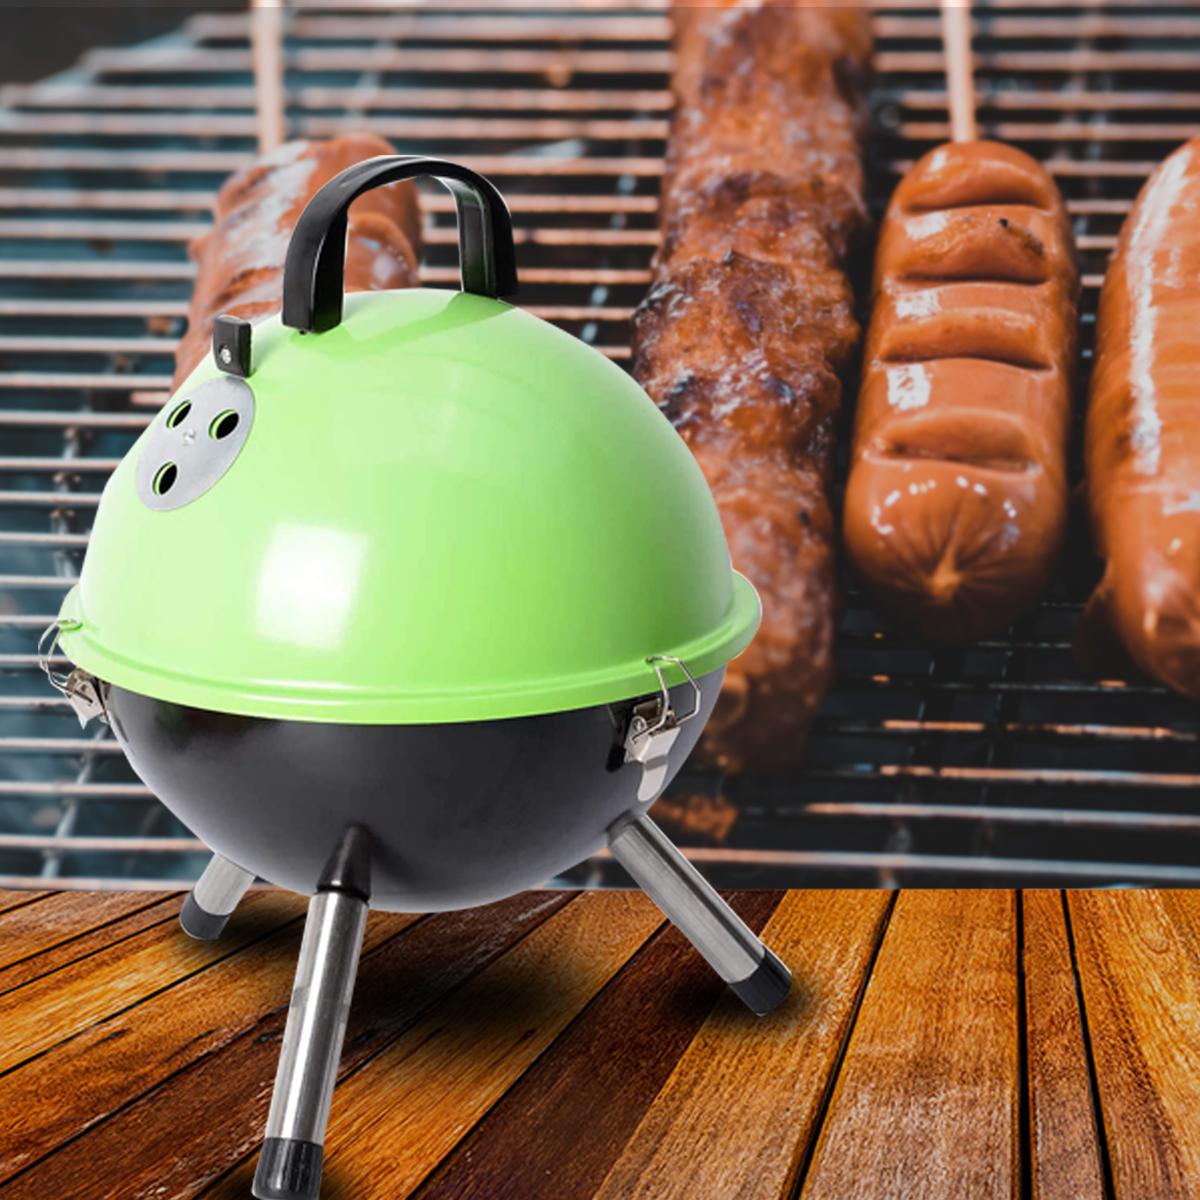 thumbnail 34 - Outdoor Backyard Cooking Mini Portable Charcoal BBQ Grill Bottom Storage